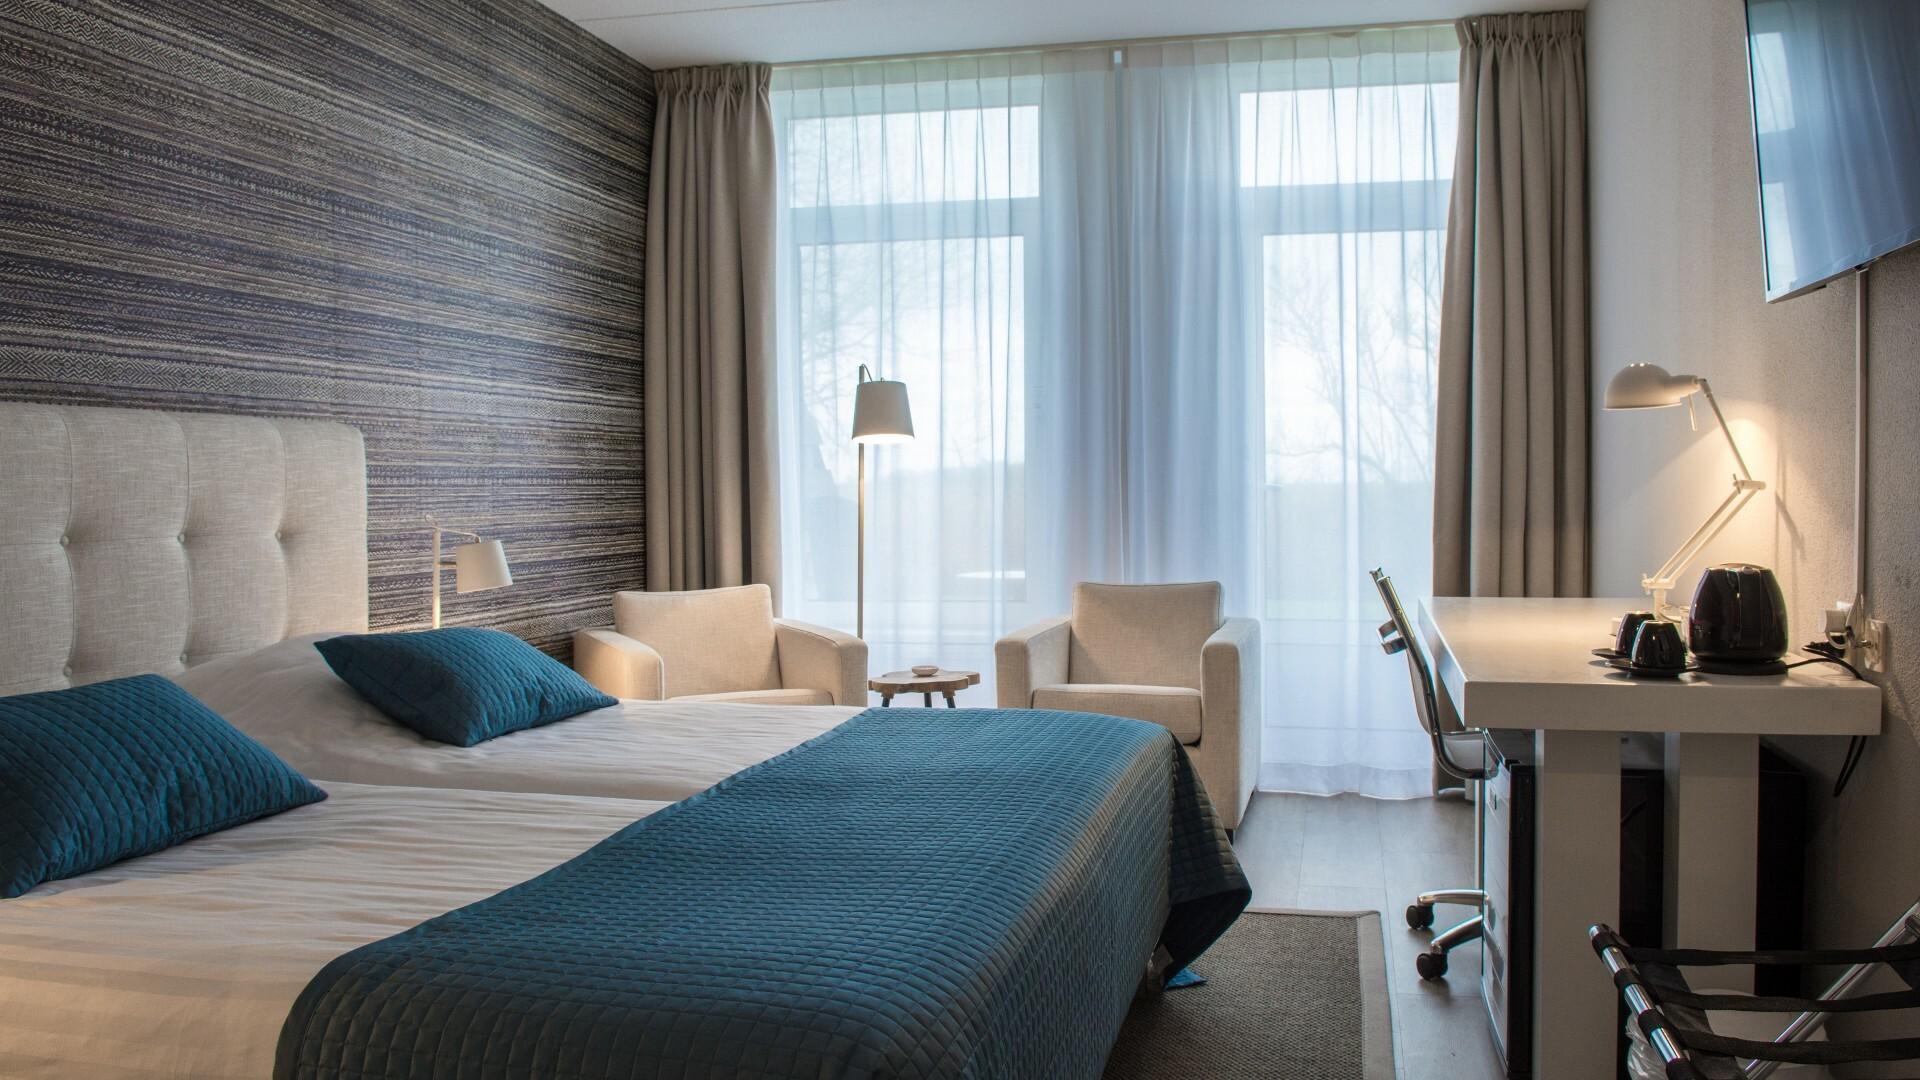 Hotel op Texel boeken molenbos VVV Texel Stefan Krofft